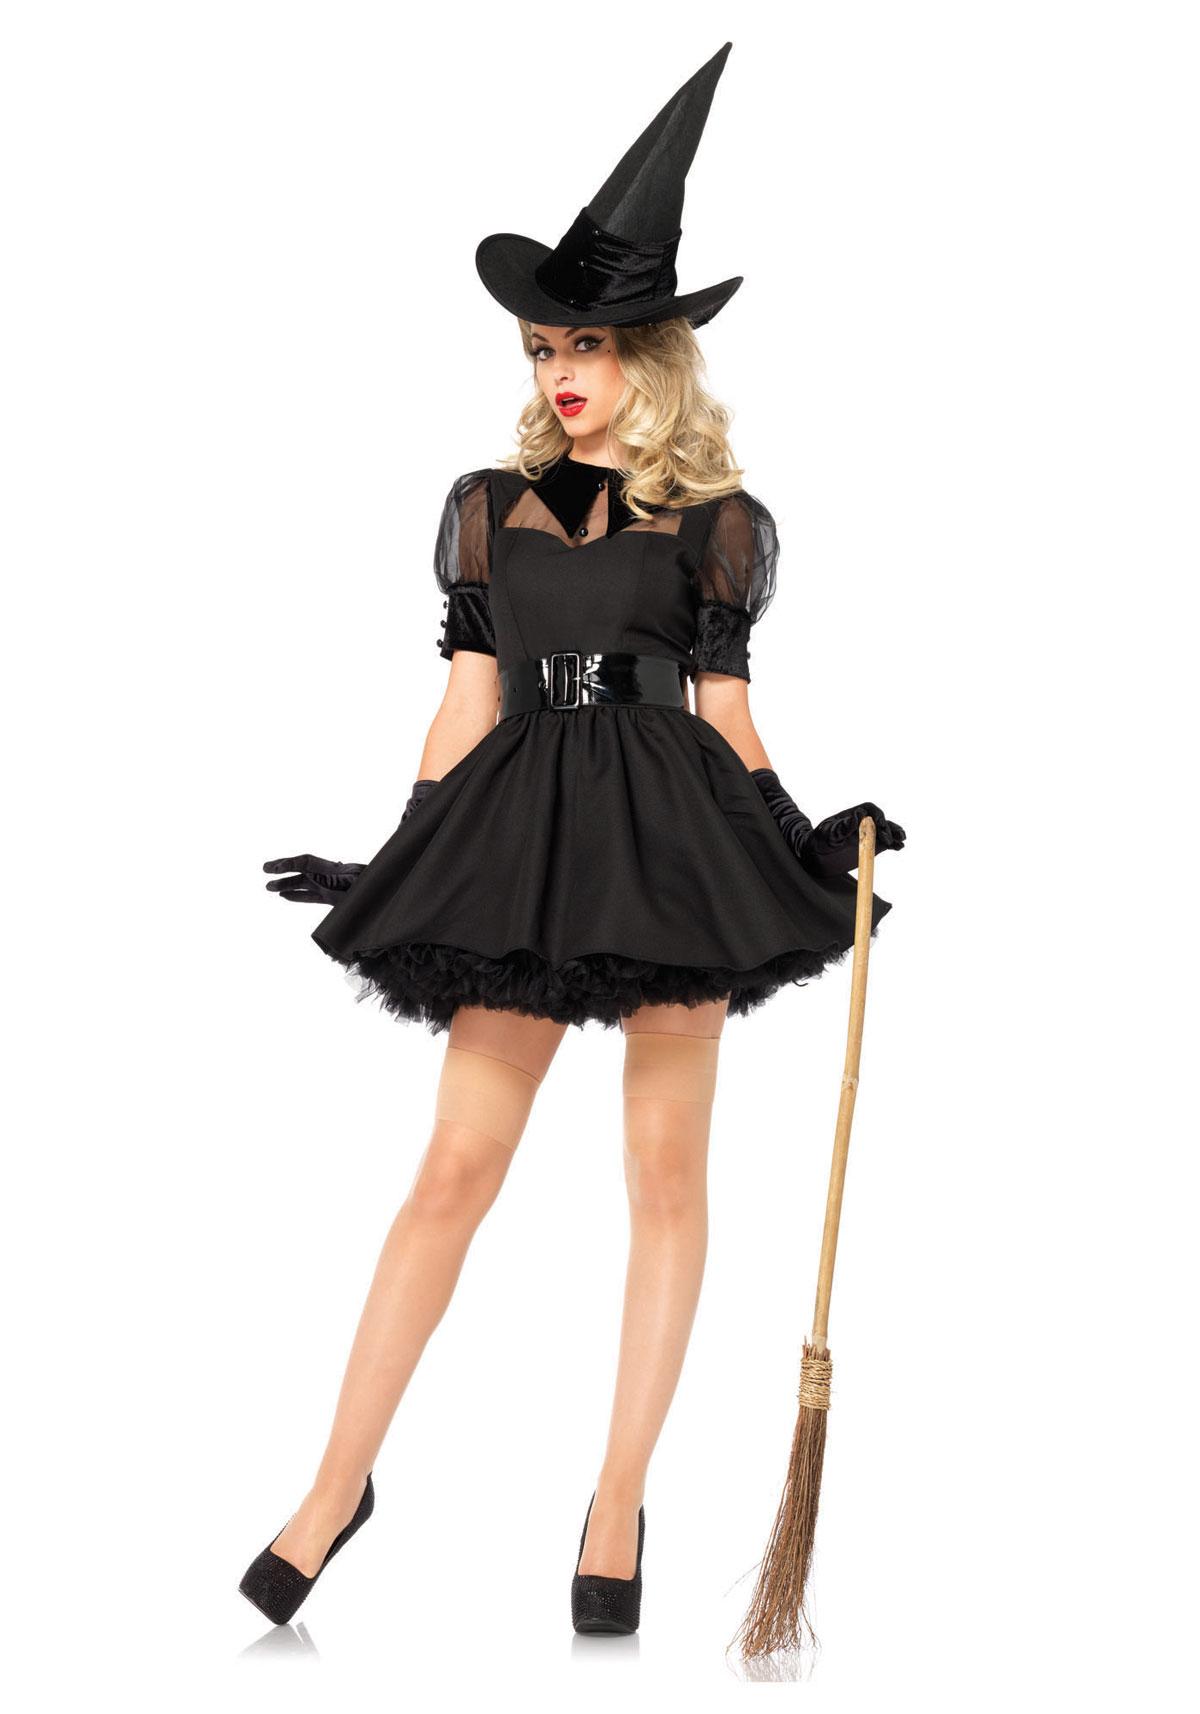 Leg Avenue 85238 Bewitching Witch Costume | eBay